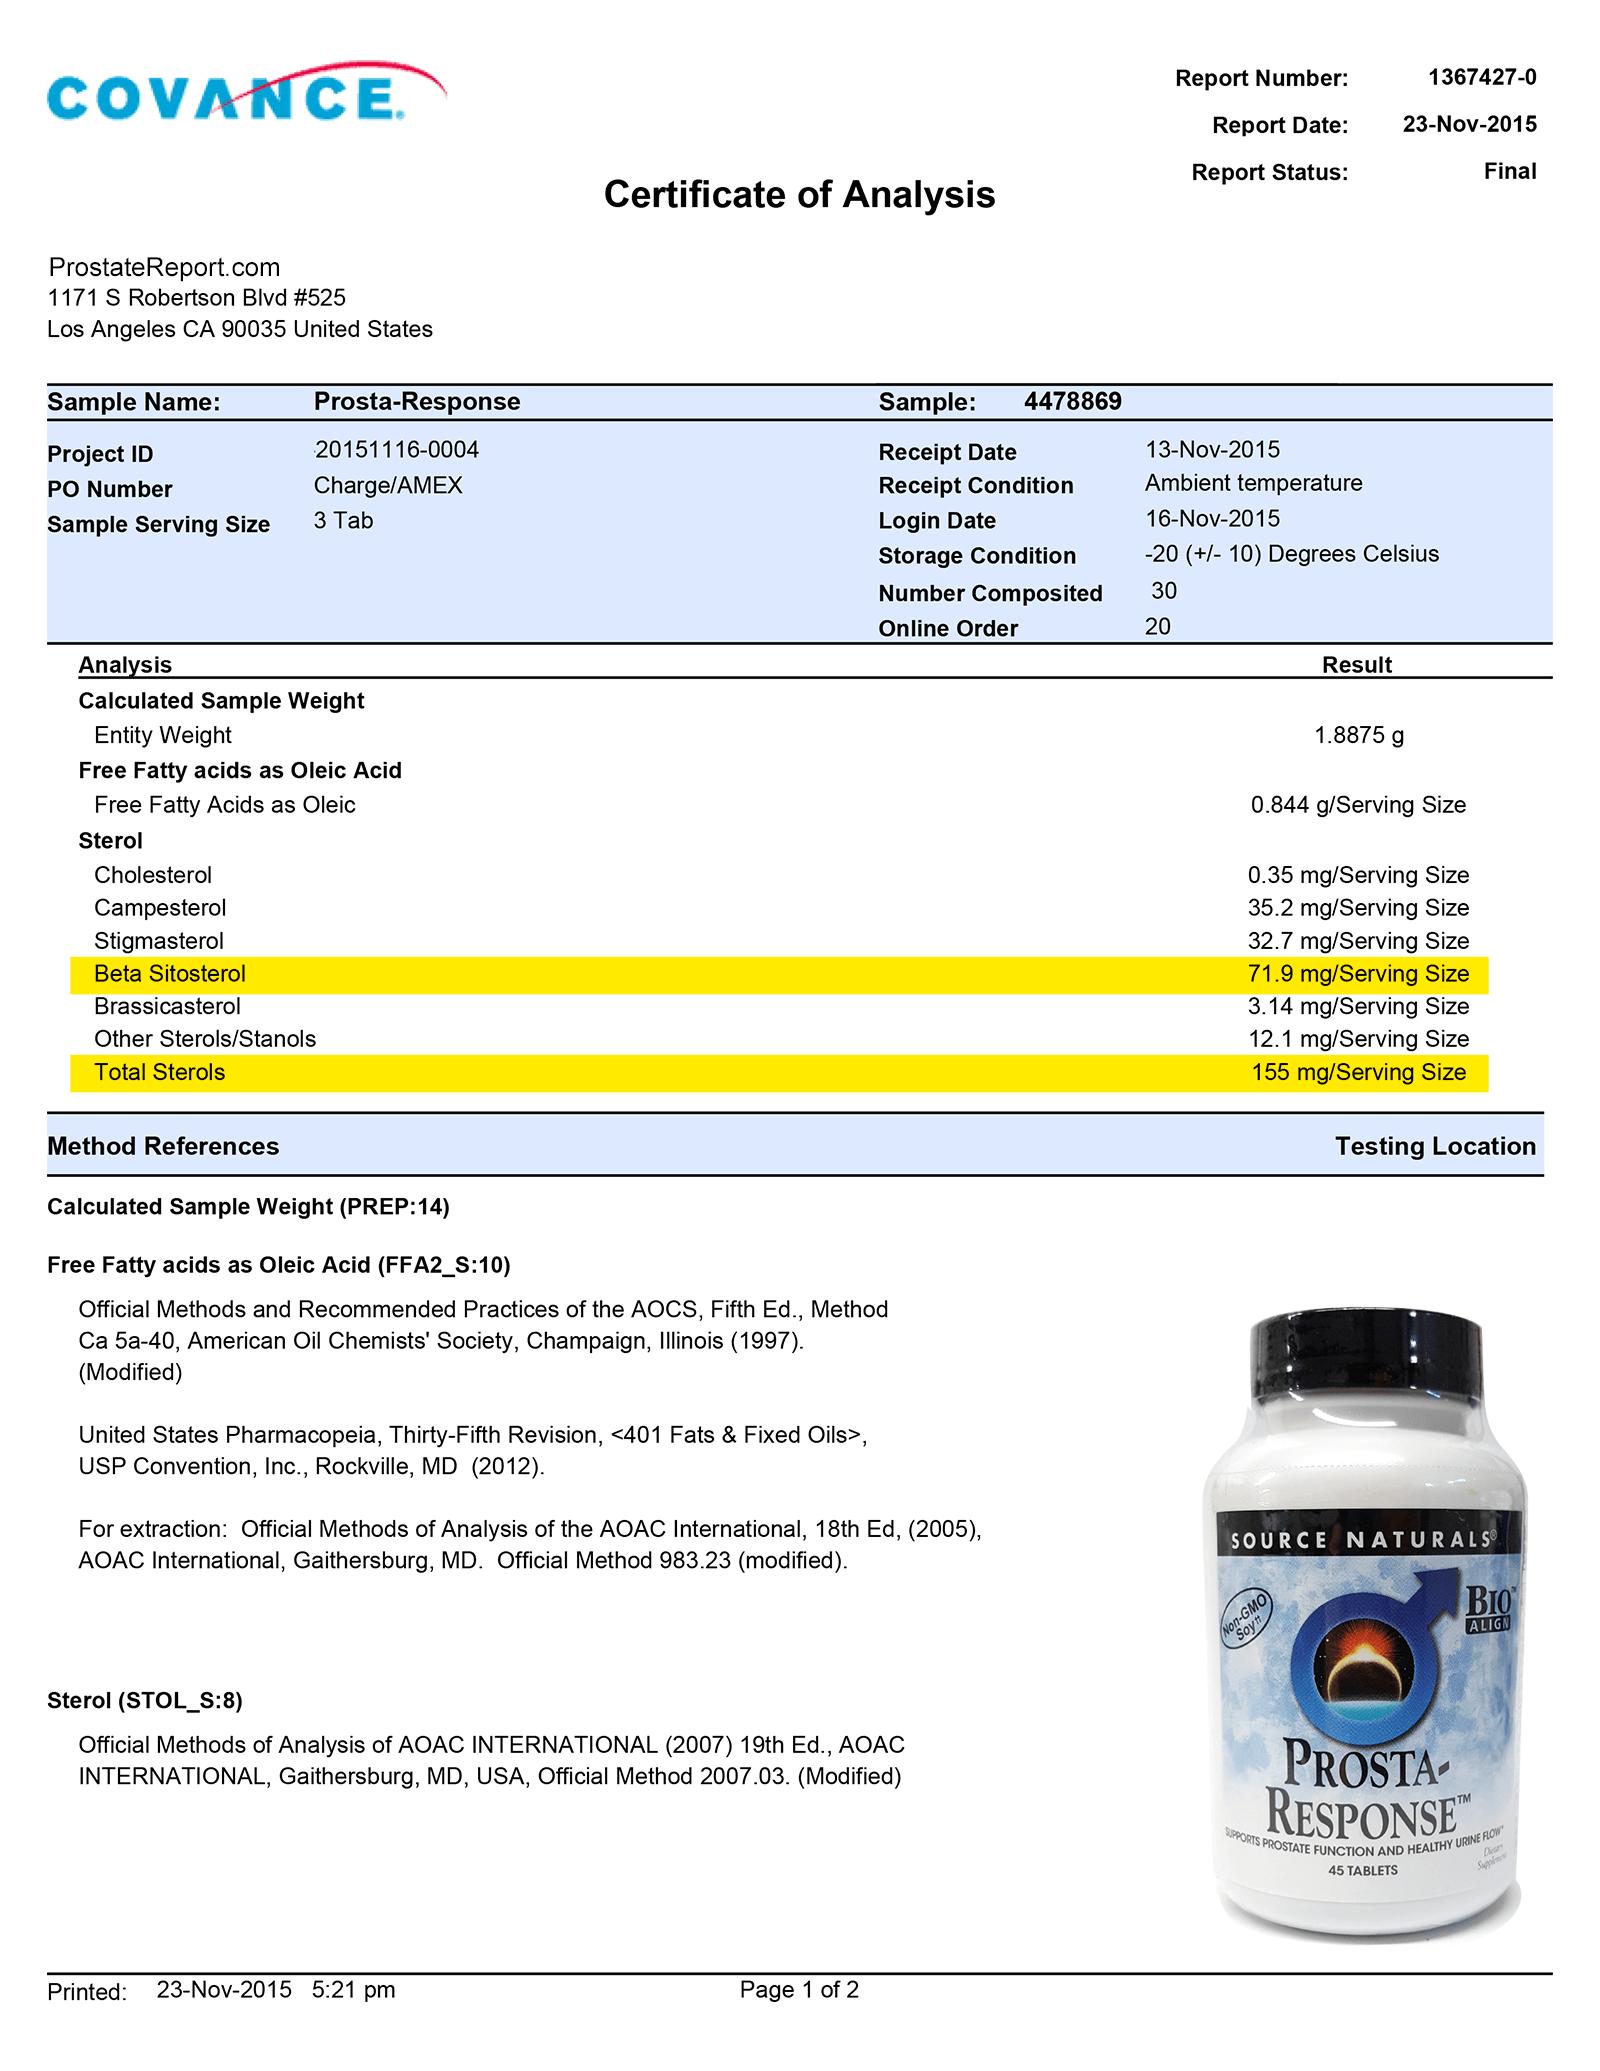 Prosta Response lab report